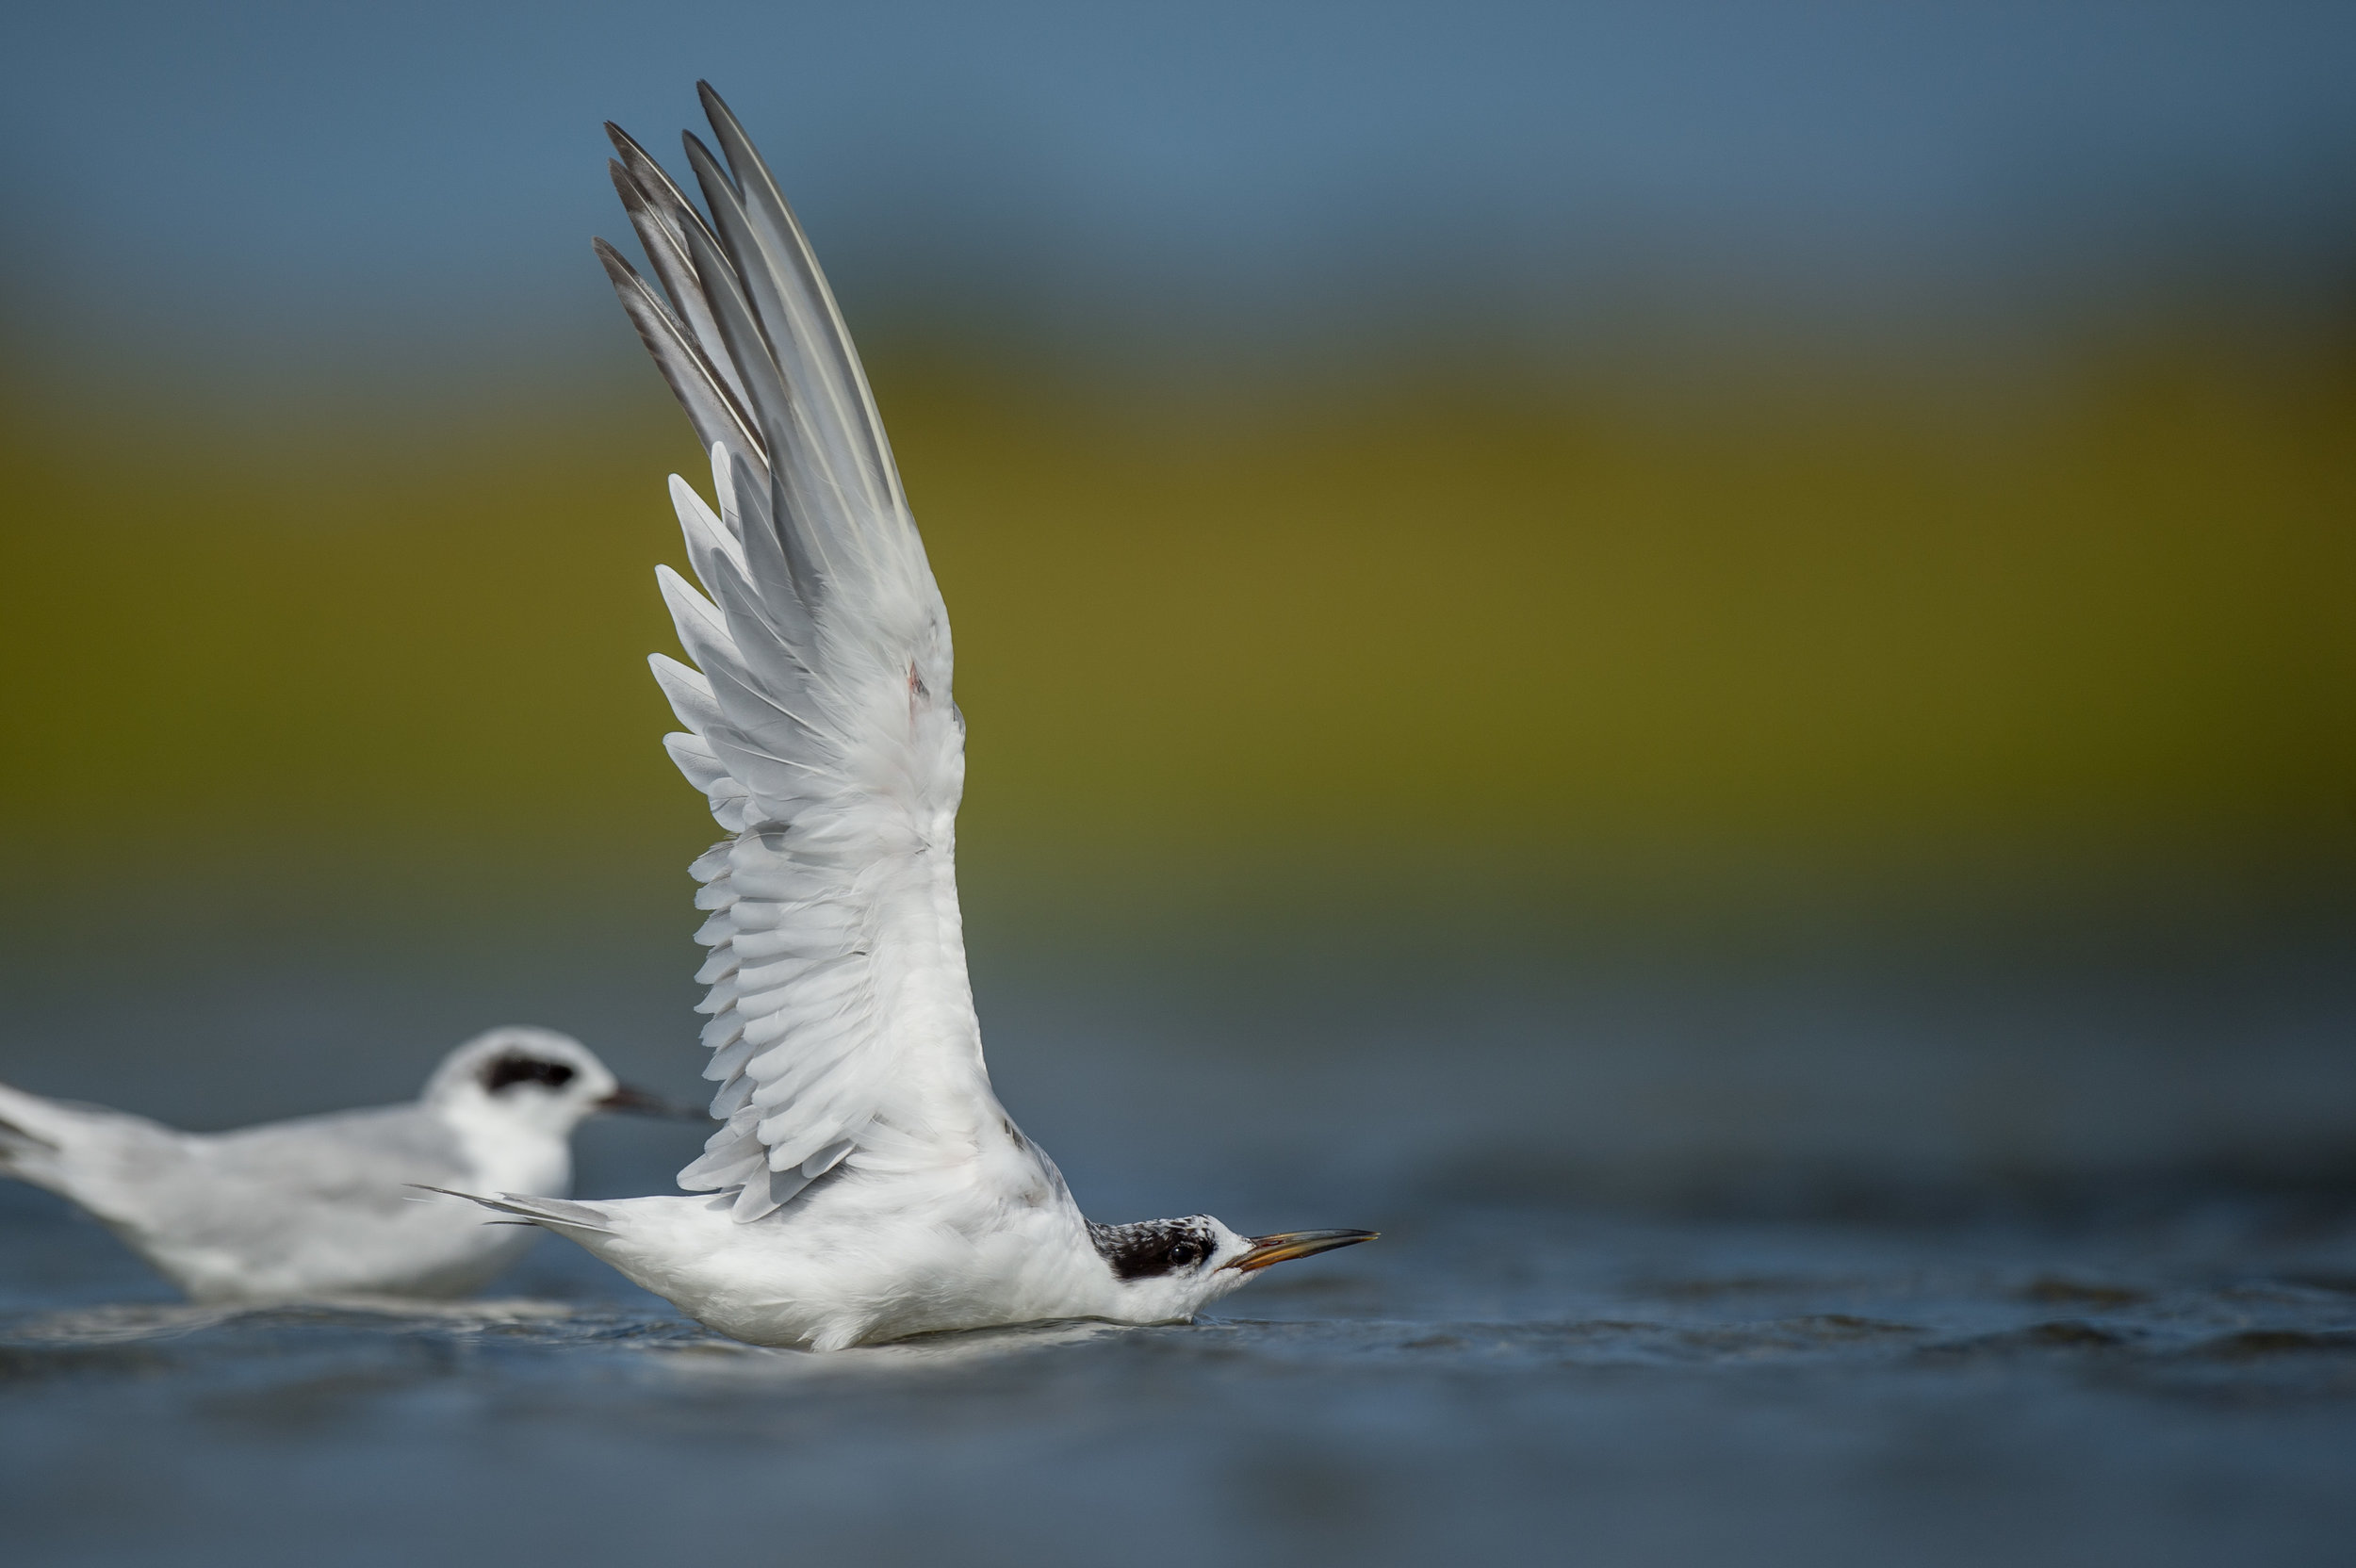 010_jersey_shorebirds.jpg